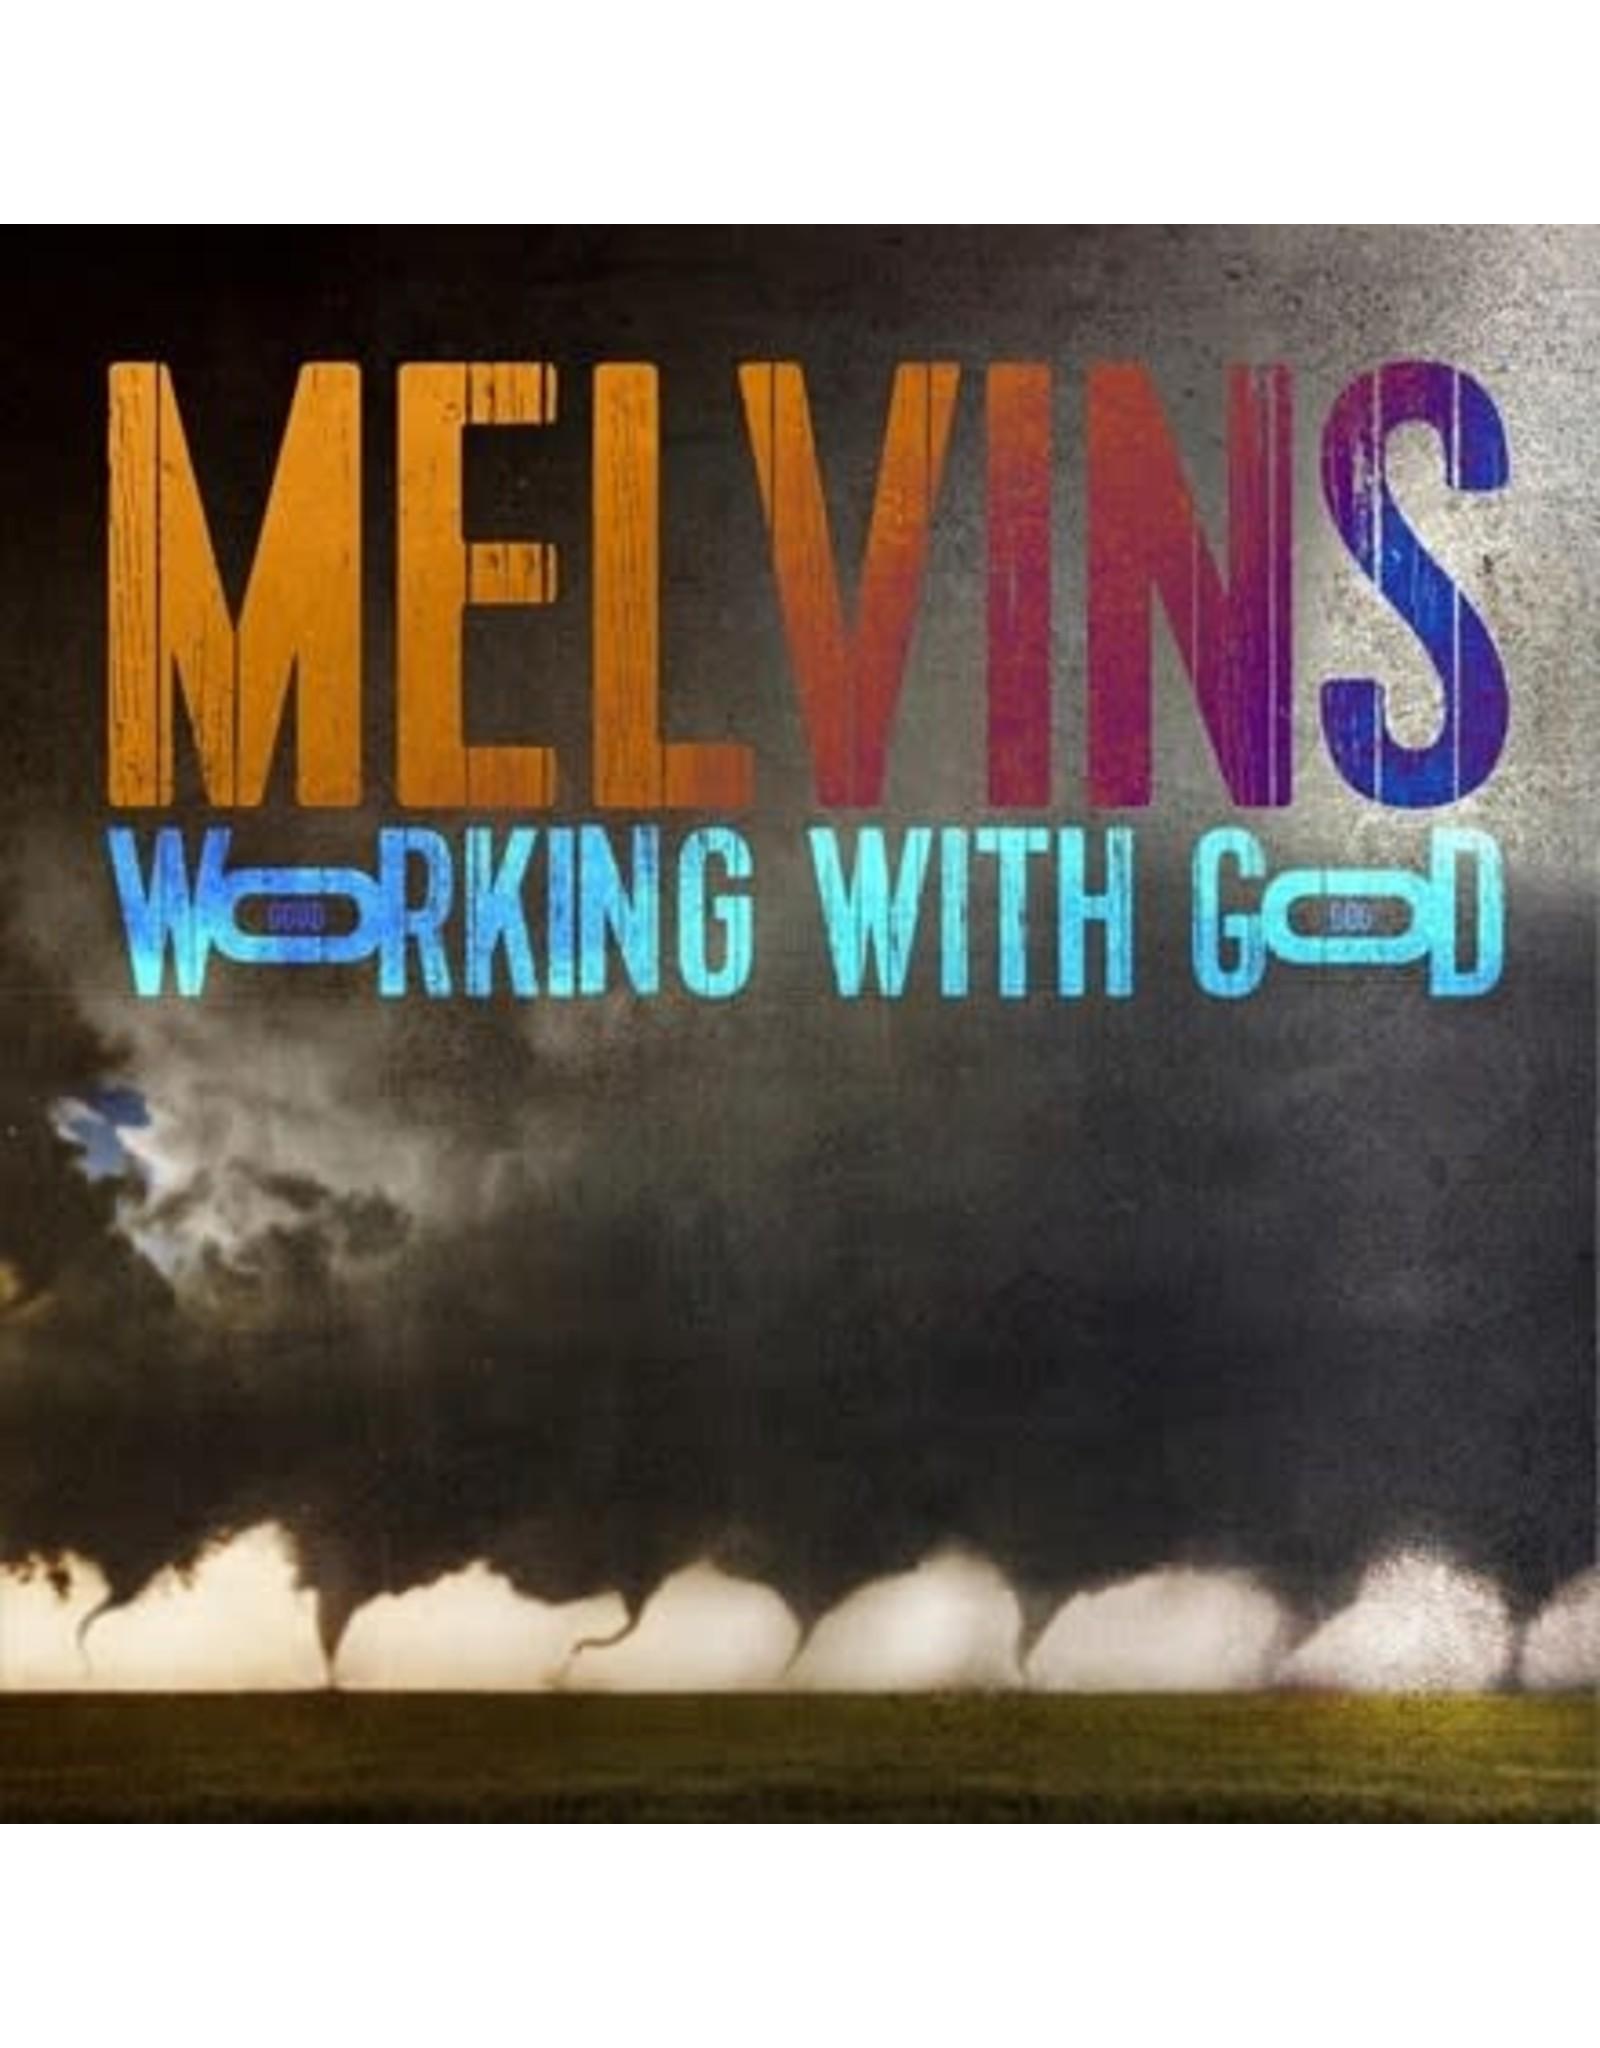 Ipecac Melvins: Working With God LP